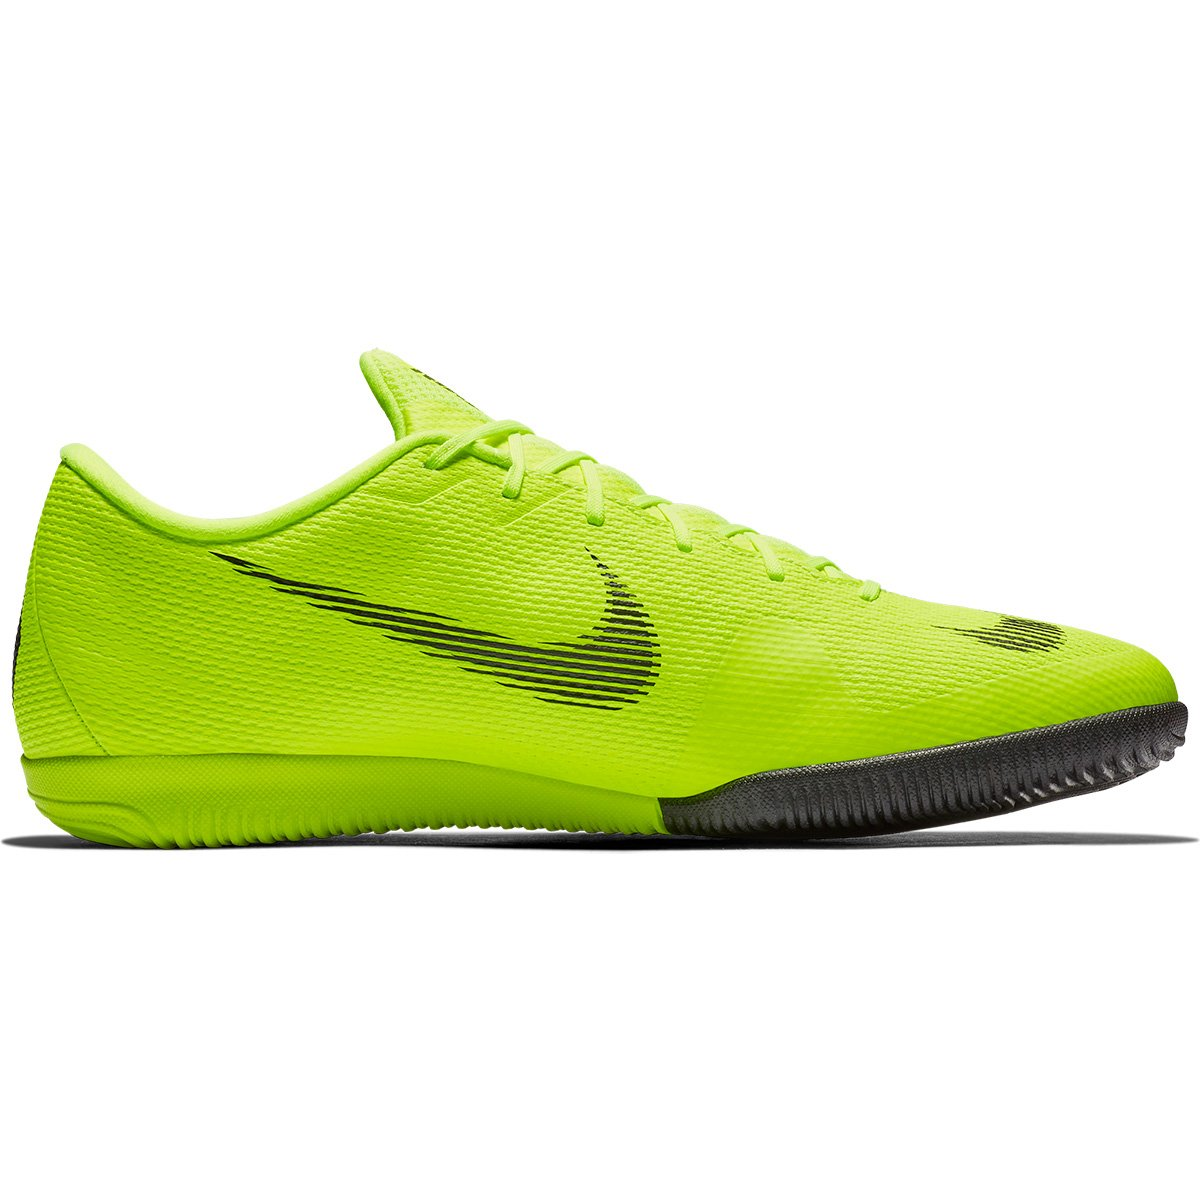 Chuteira Futsal Nike Mercurial Vapor 12 Academy - Verde e Preto ... 8c9d9603c61b9